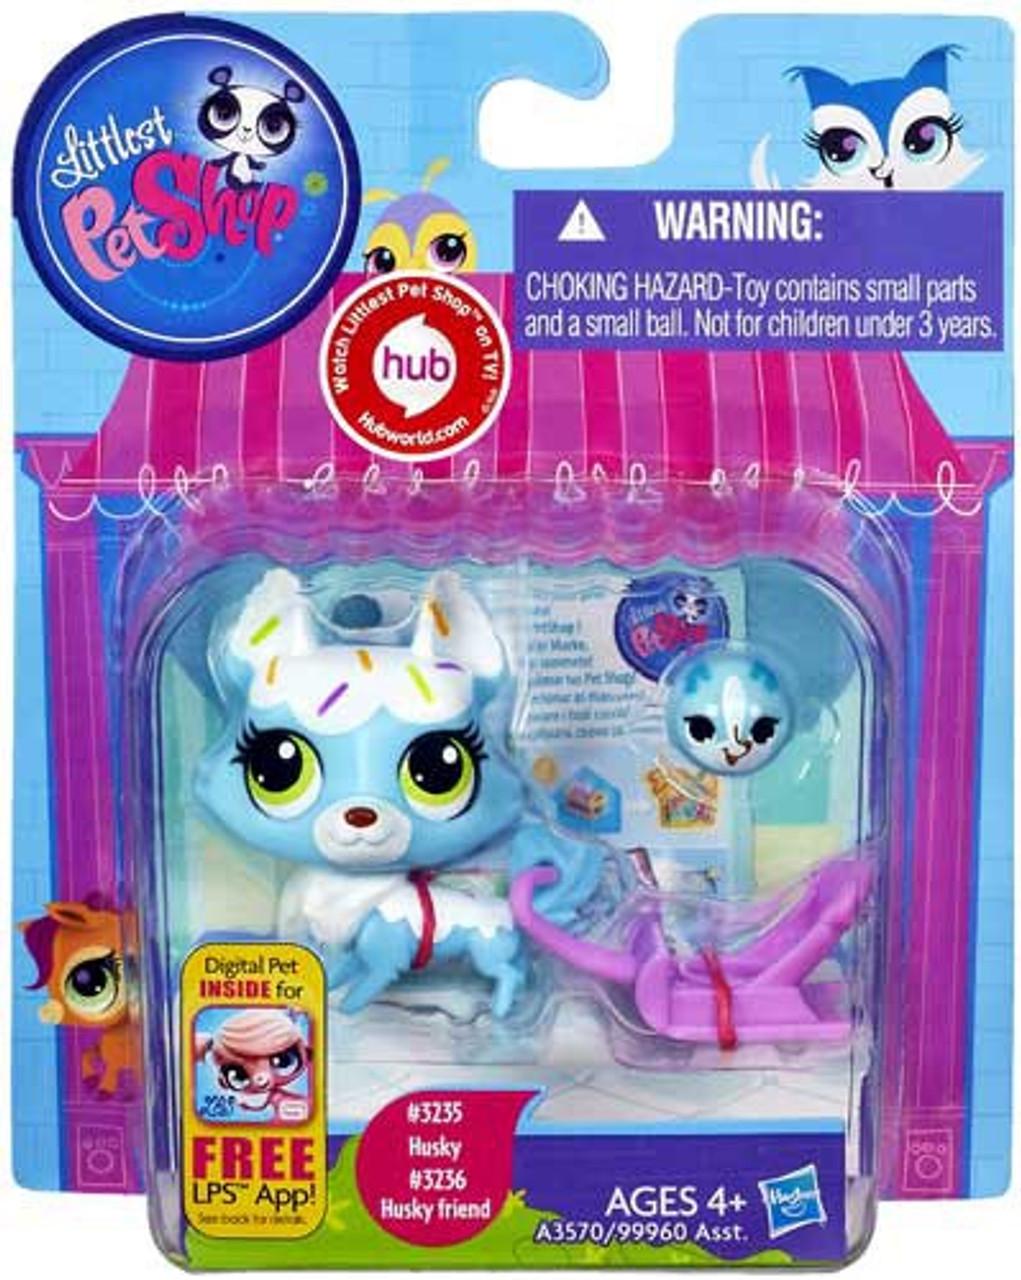 Littlest Pet Shop Husky & Husky Friend Figure 2-Pack #3235, 3236 [Blue]